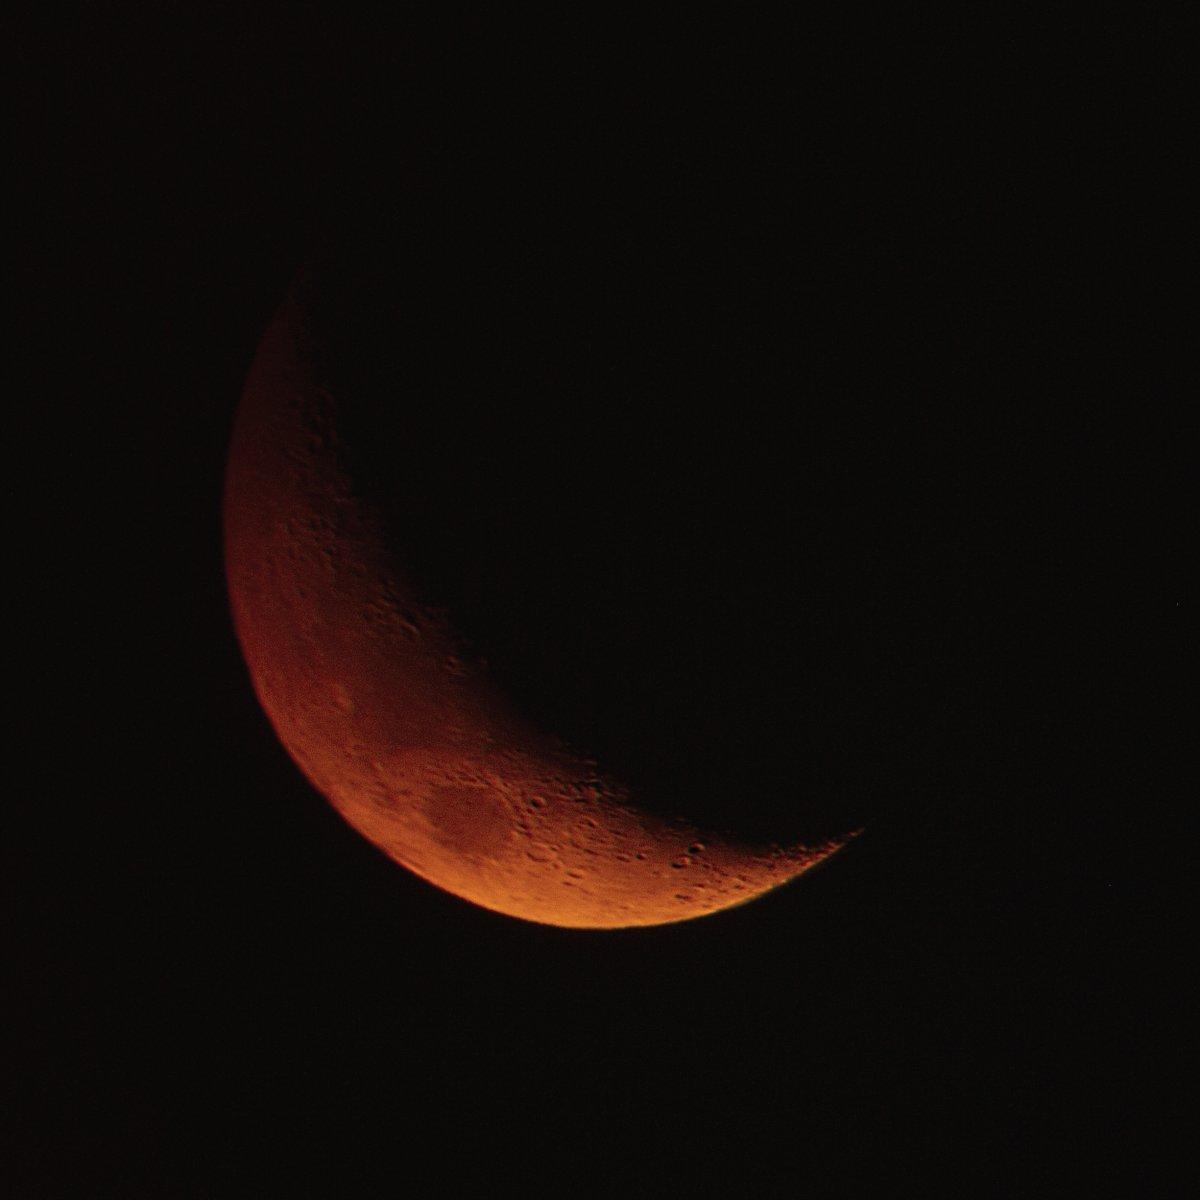 Dün gece Ay.  #astrofotografi #astrophotography #ay #moon #telescope #teleskop https://t.co/J4VK0ovV4f